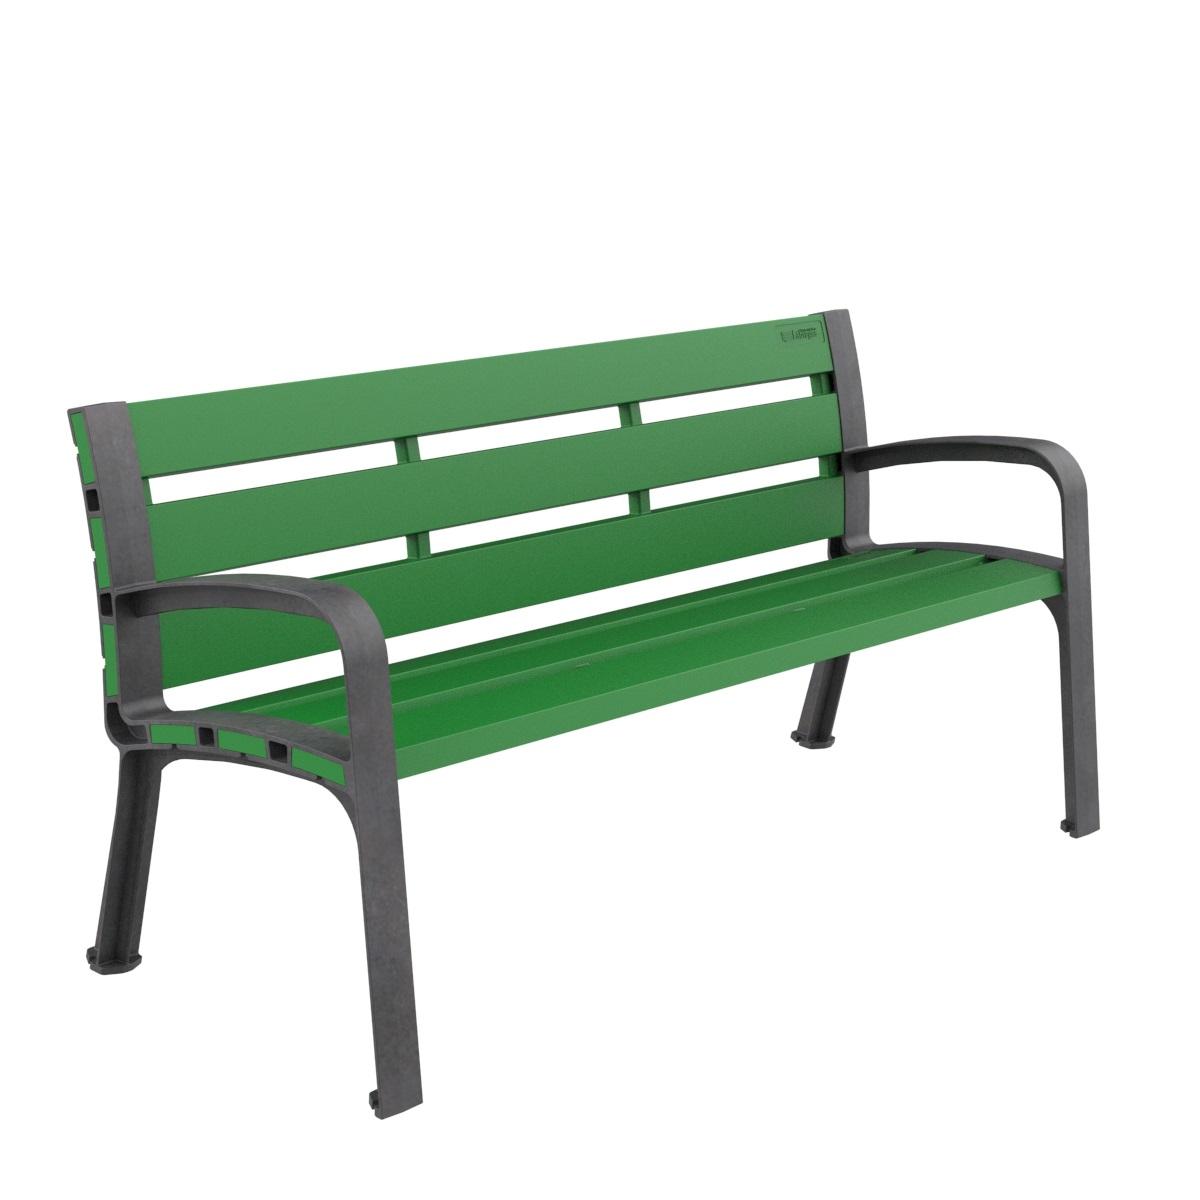 banco plastico modo polipropileno mobiliario urbano para